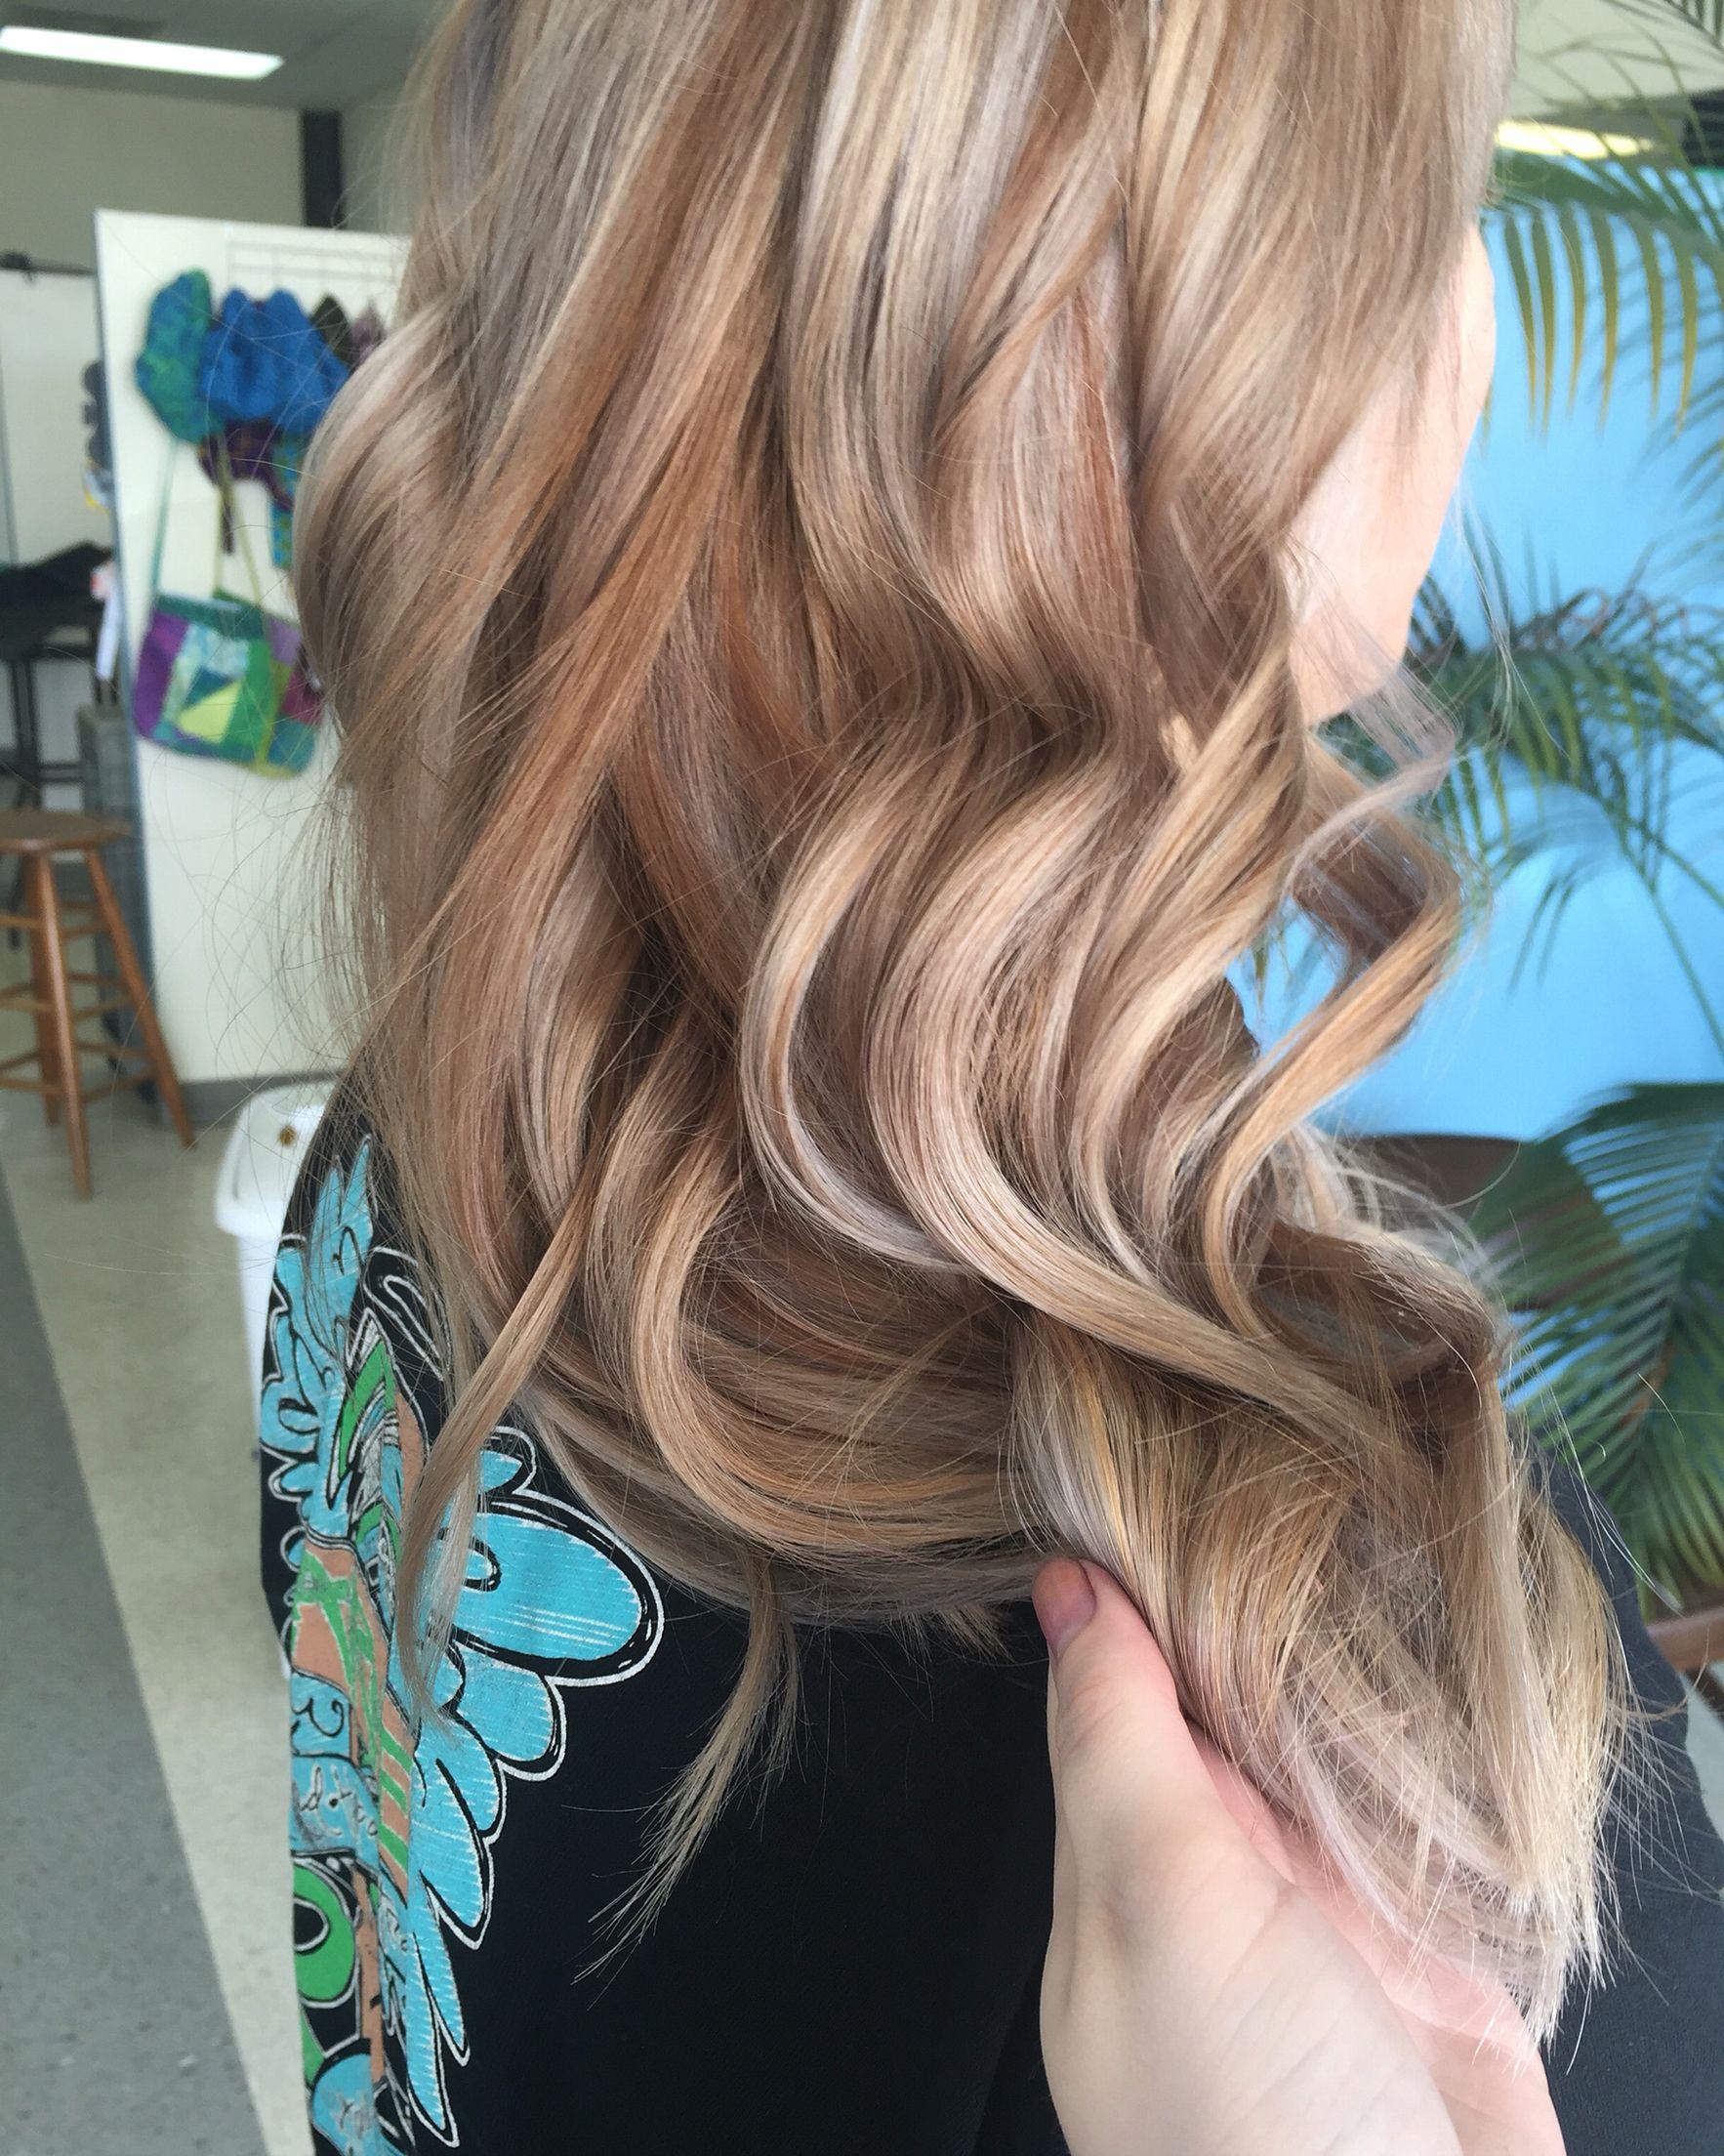 Rust metallic hair